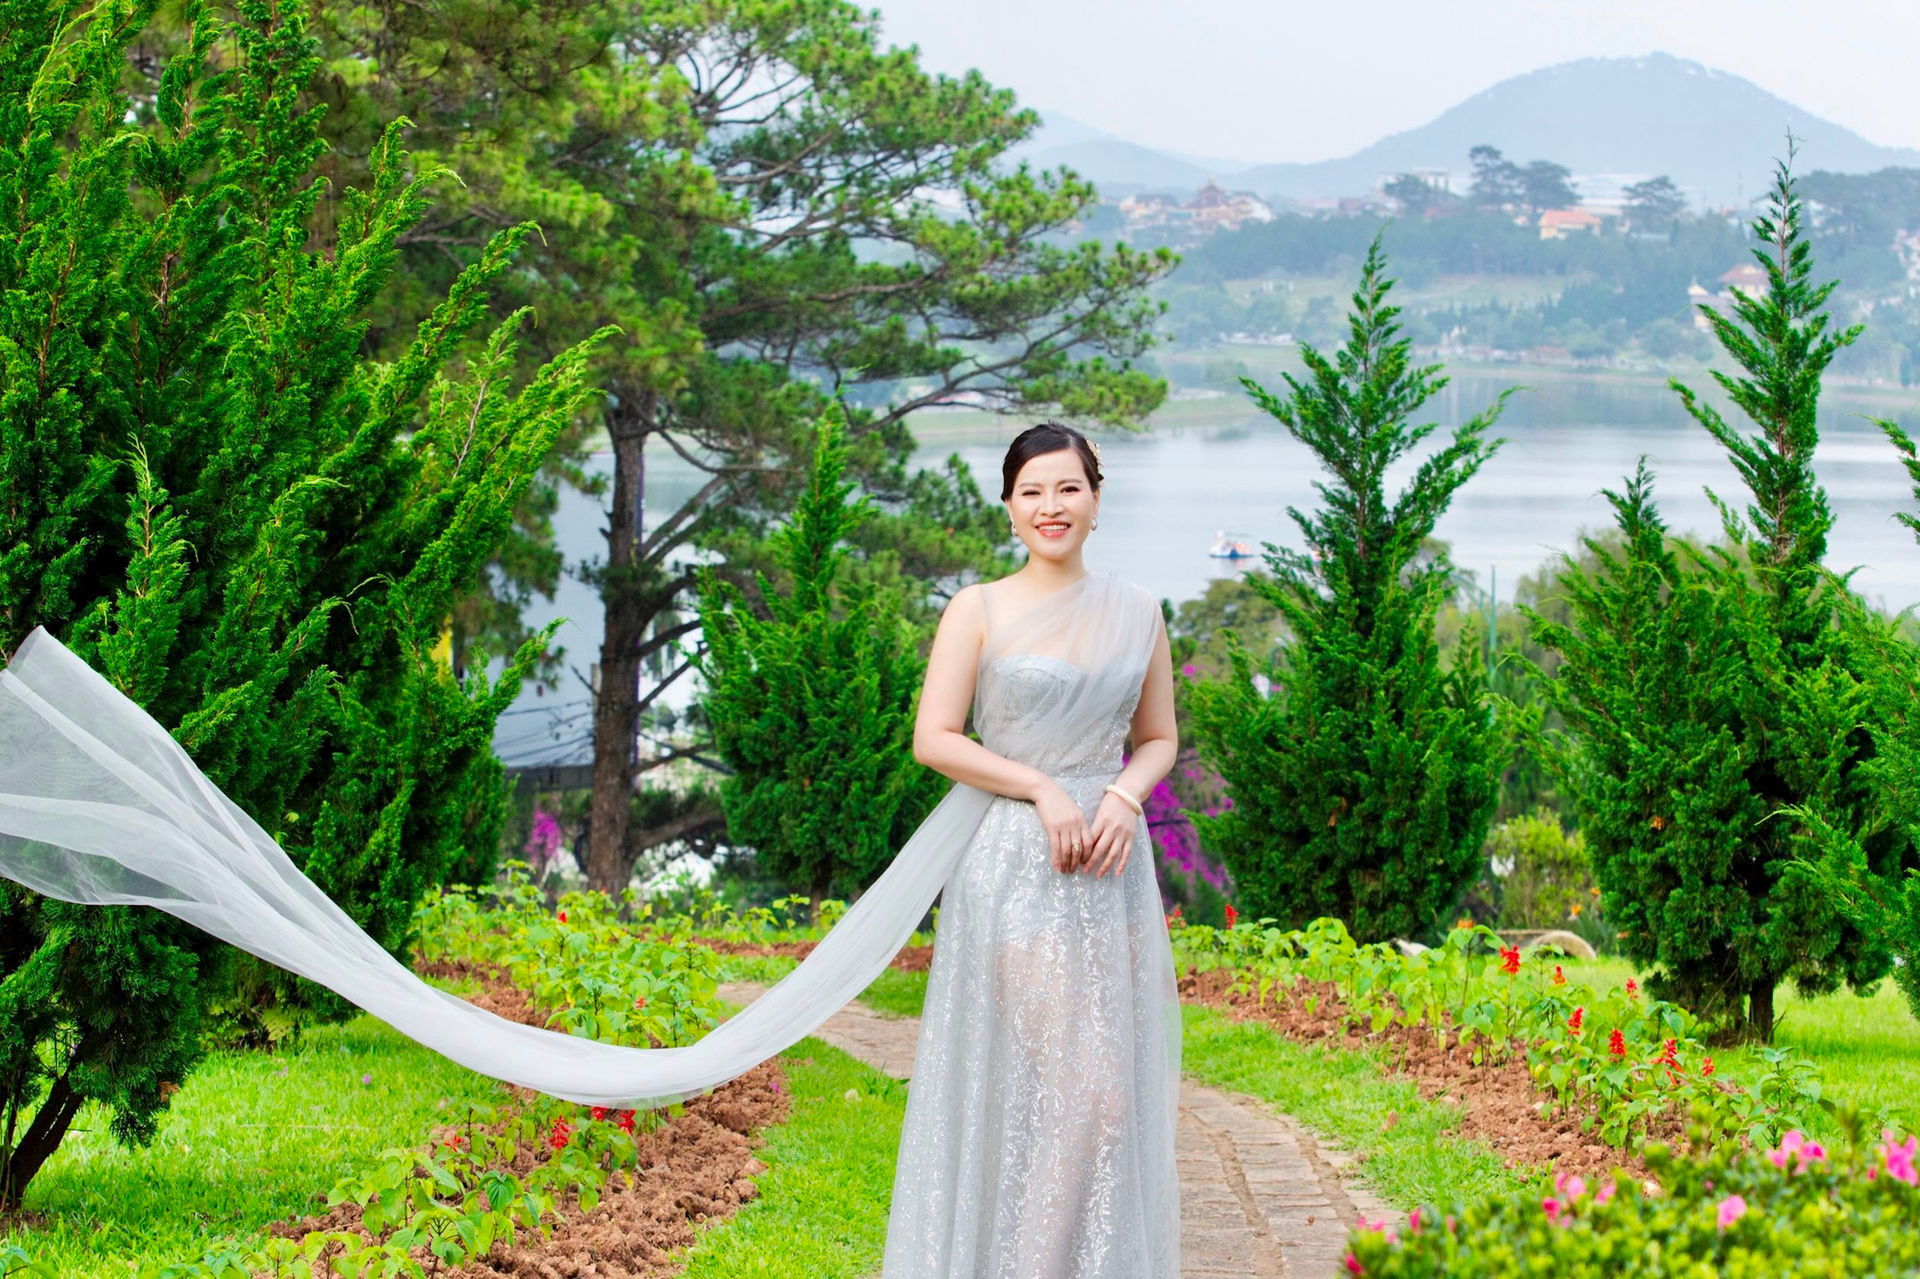 chi-phuong-7.jpg